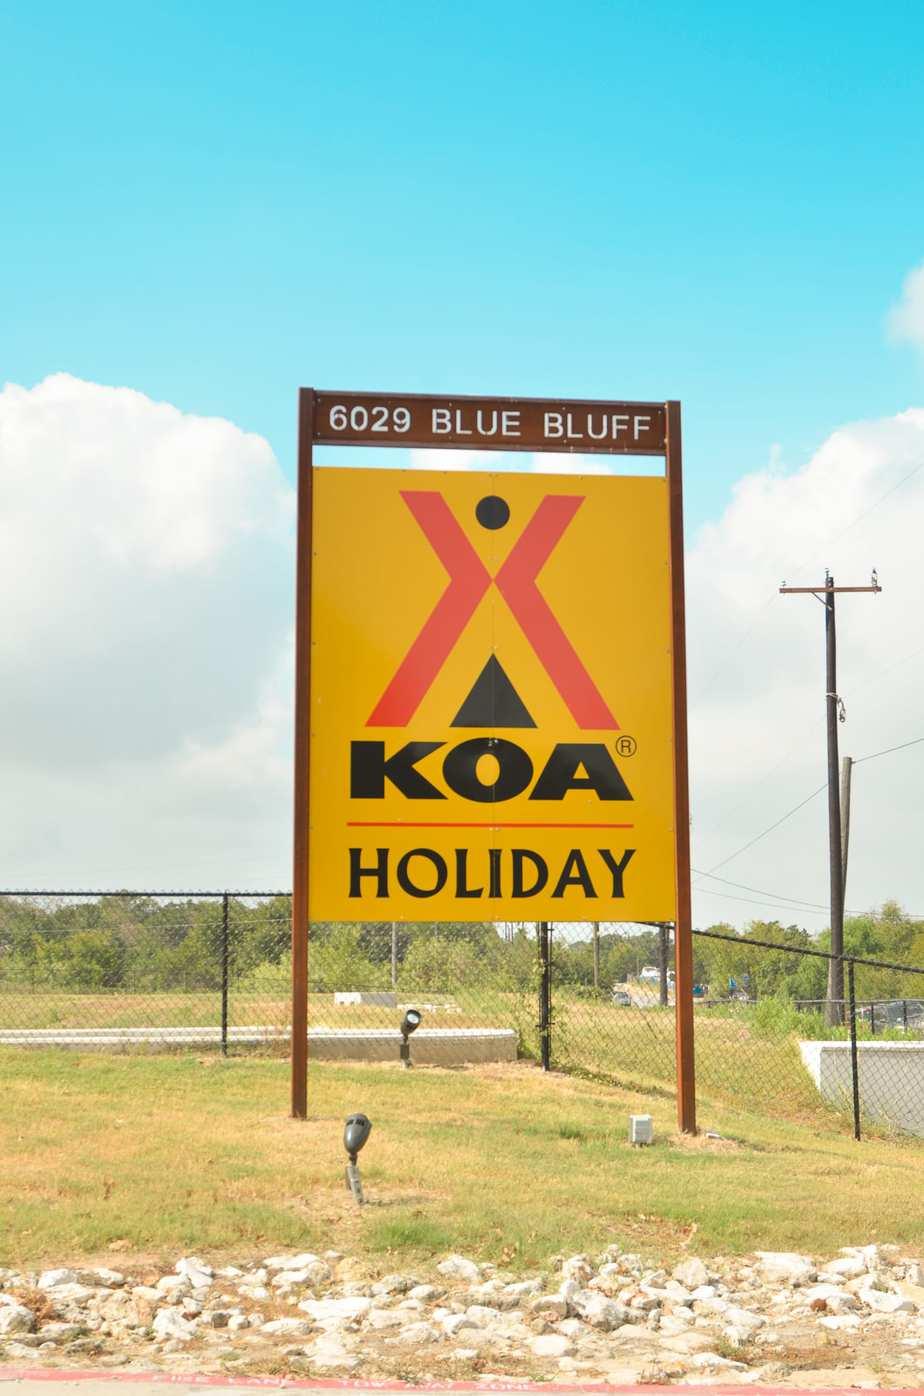 East Austin KOA Holiday at Blue Bluff Rd